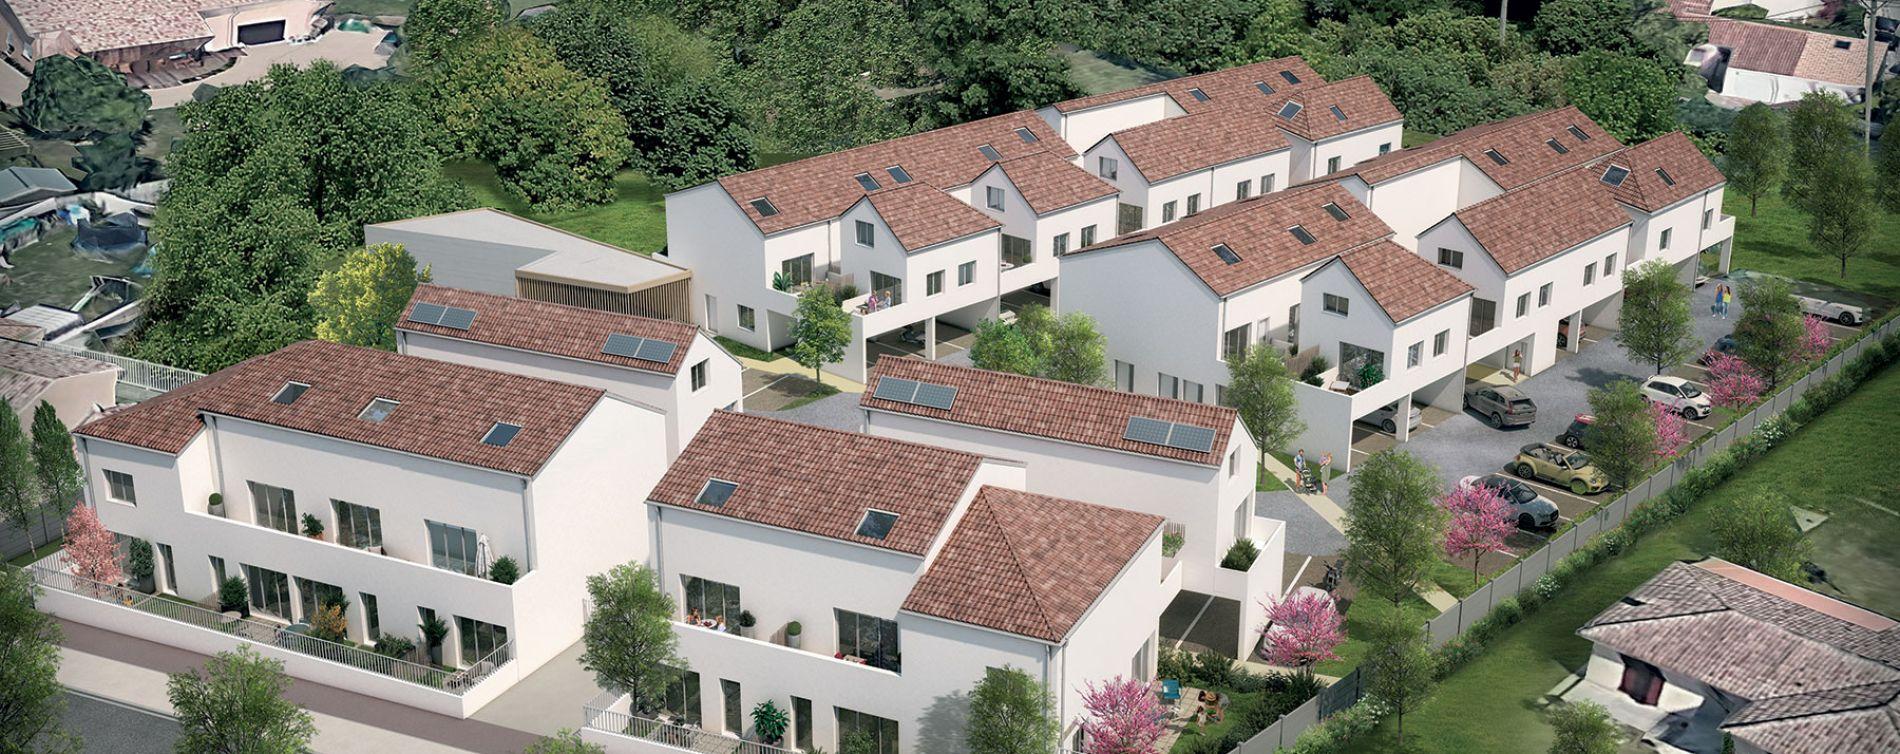 Résidence Midori à Villenave-d'Ornon